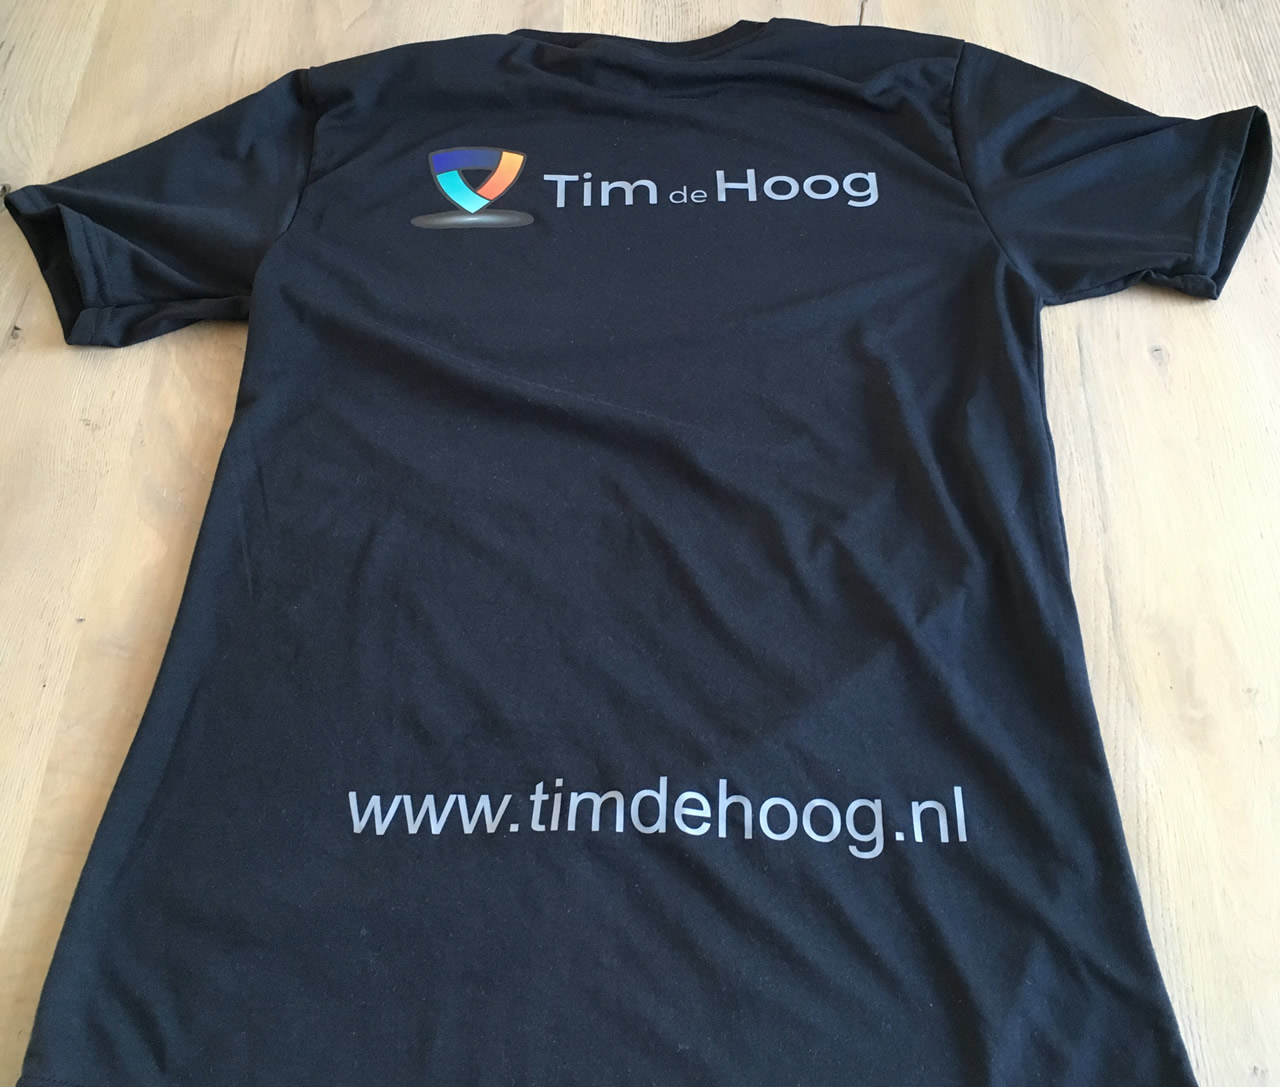 Timdehoog.nl sport T-shirt achterkant.